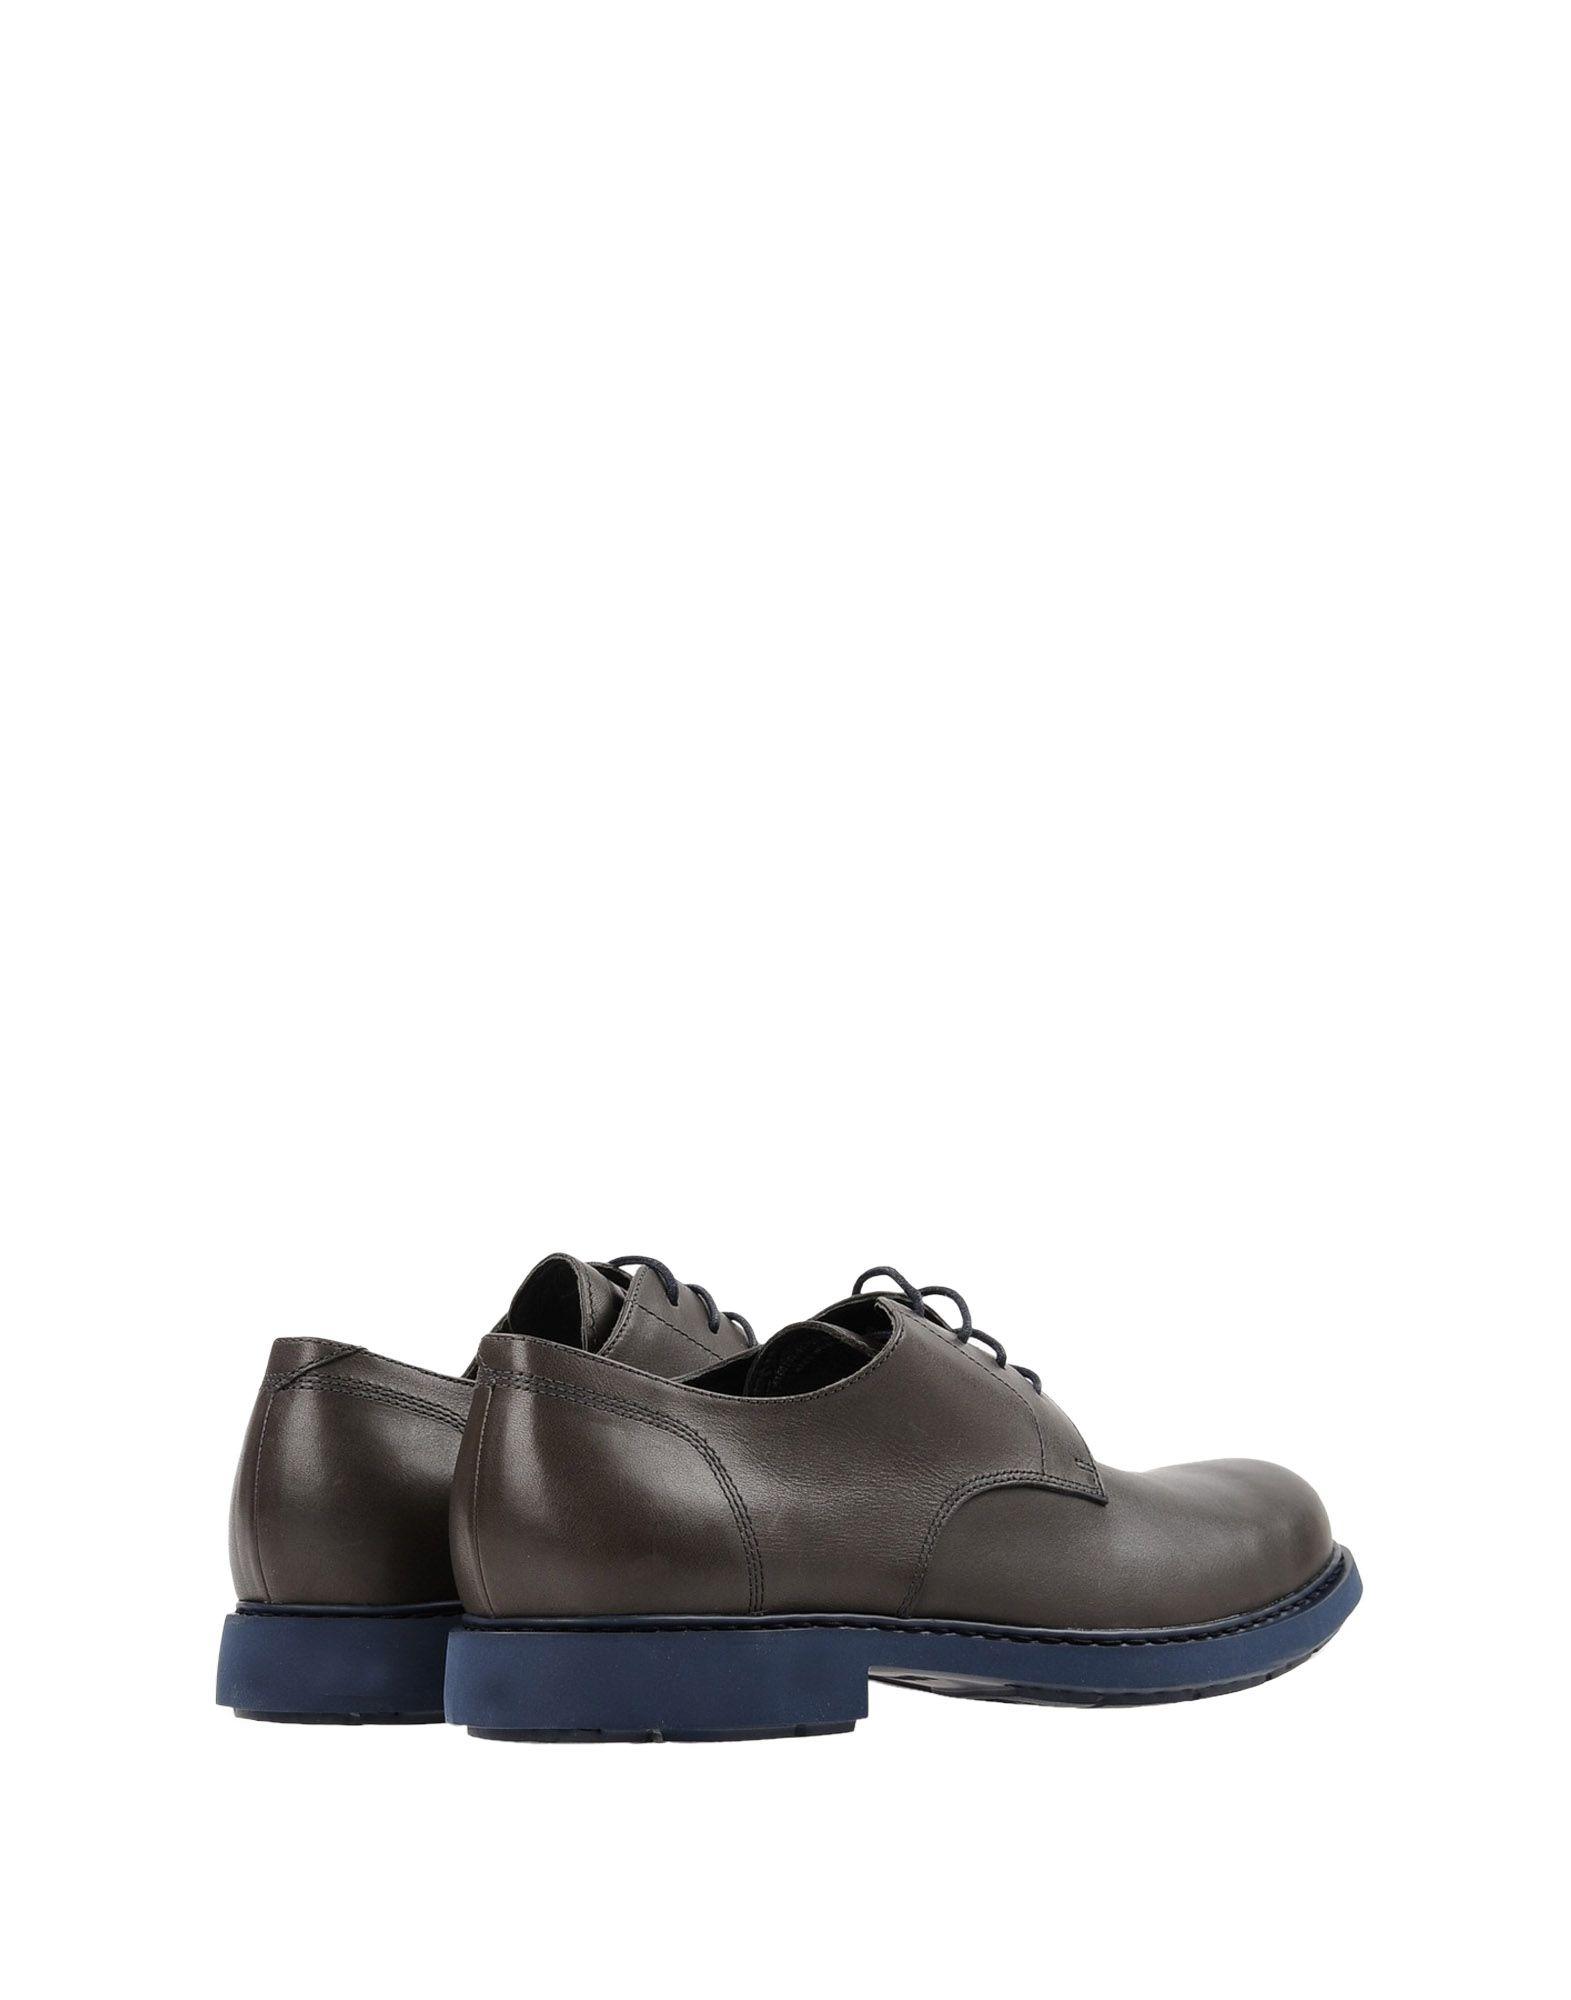 Chaussures À Lacets Camper Neuman - Homme - Chaussures À Lacets Camper sur